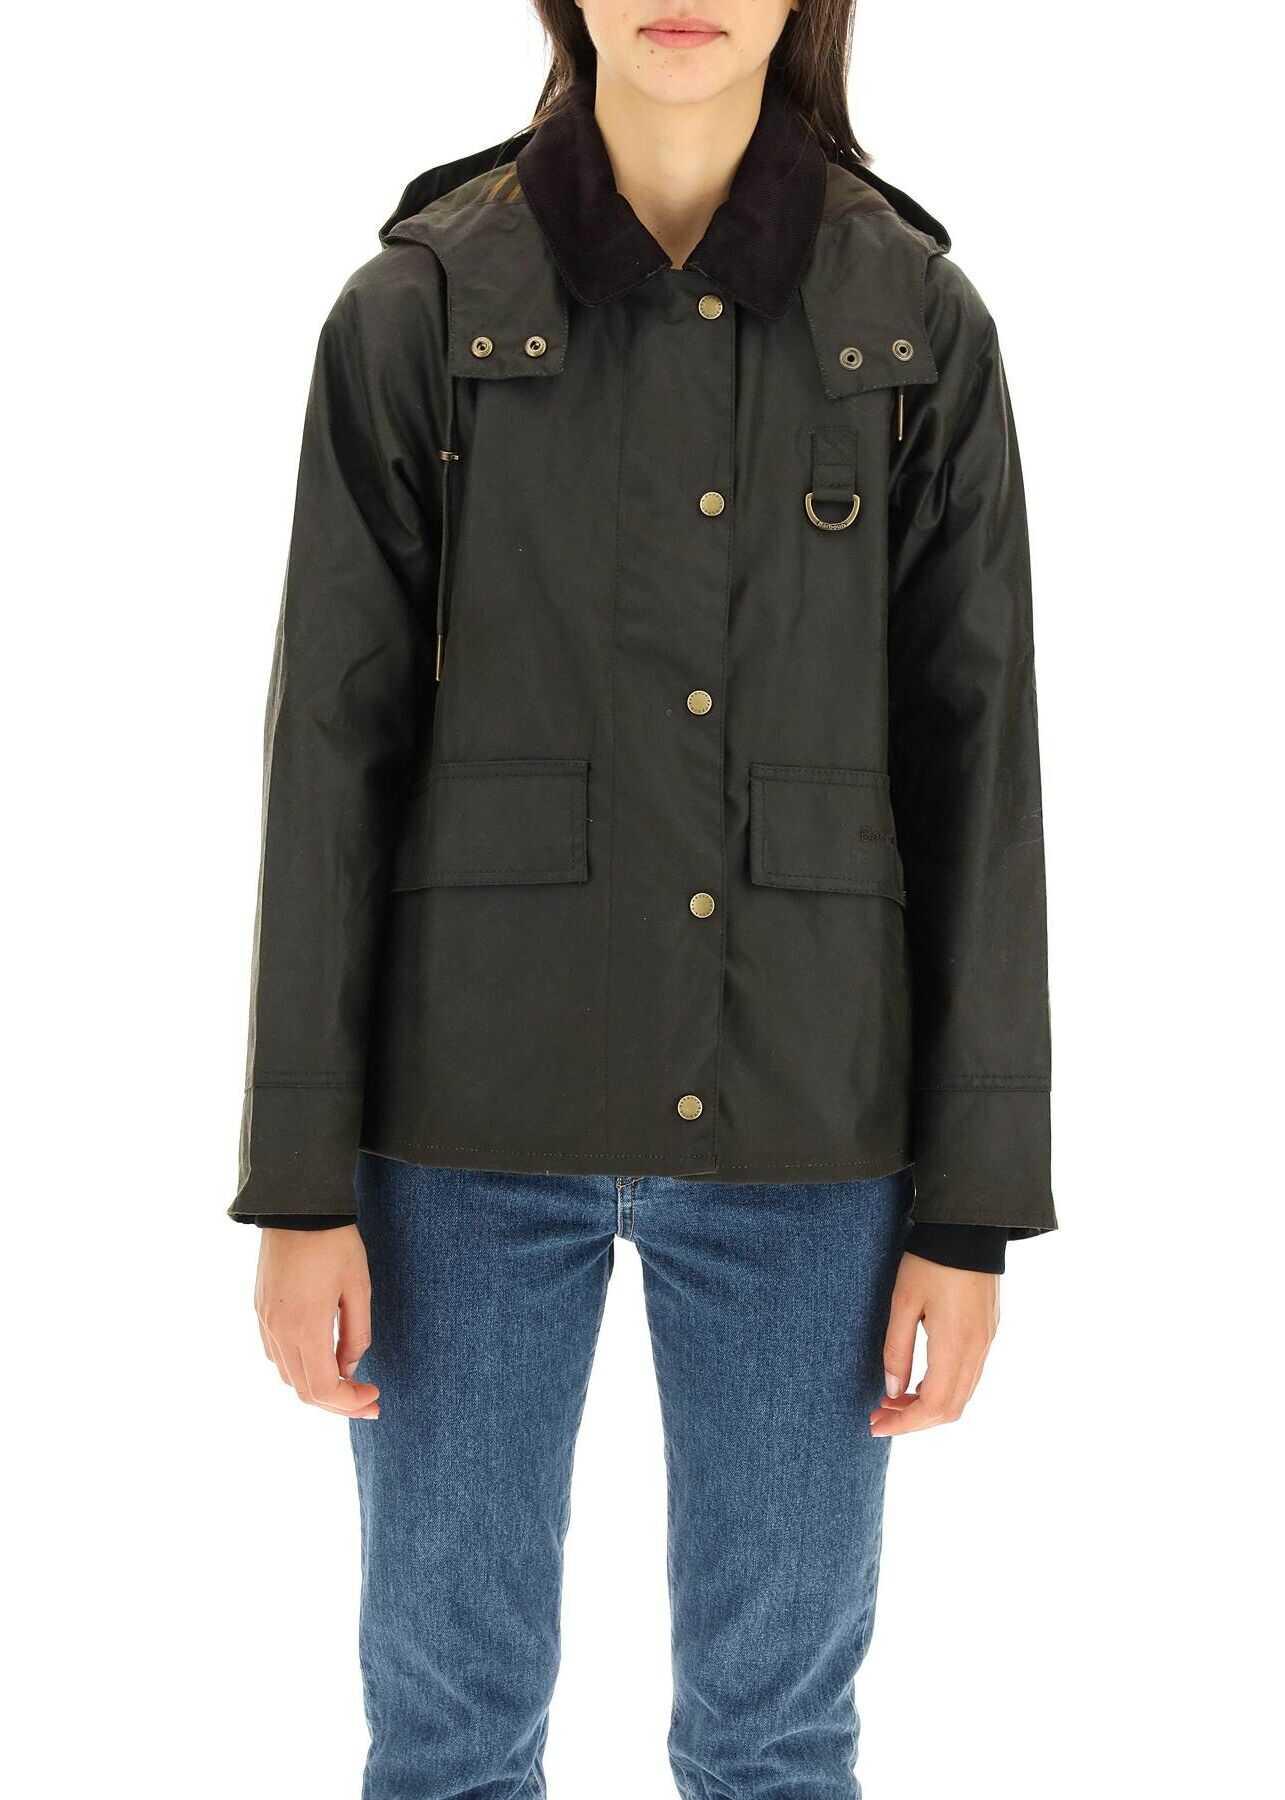 Barbour Avon Wax Jacket LWX1081 OLIVE CLASSIC image0